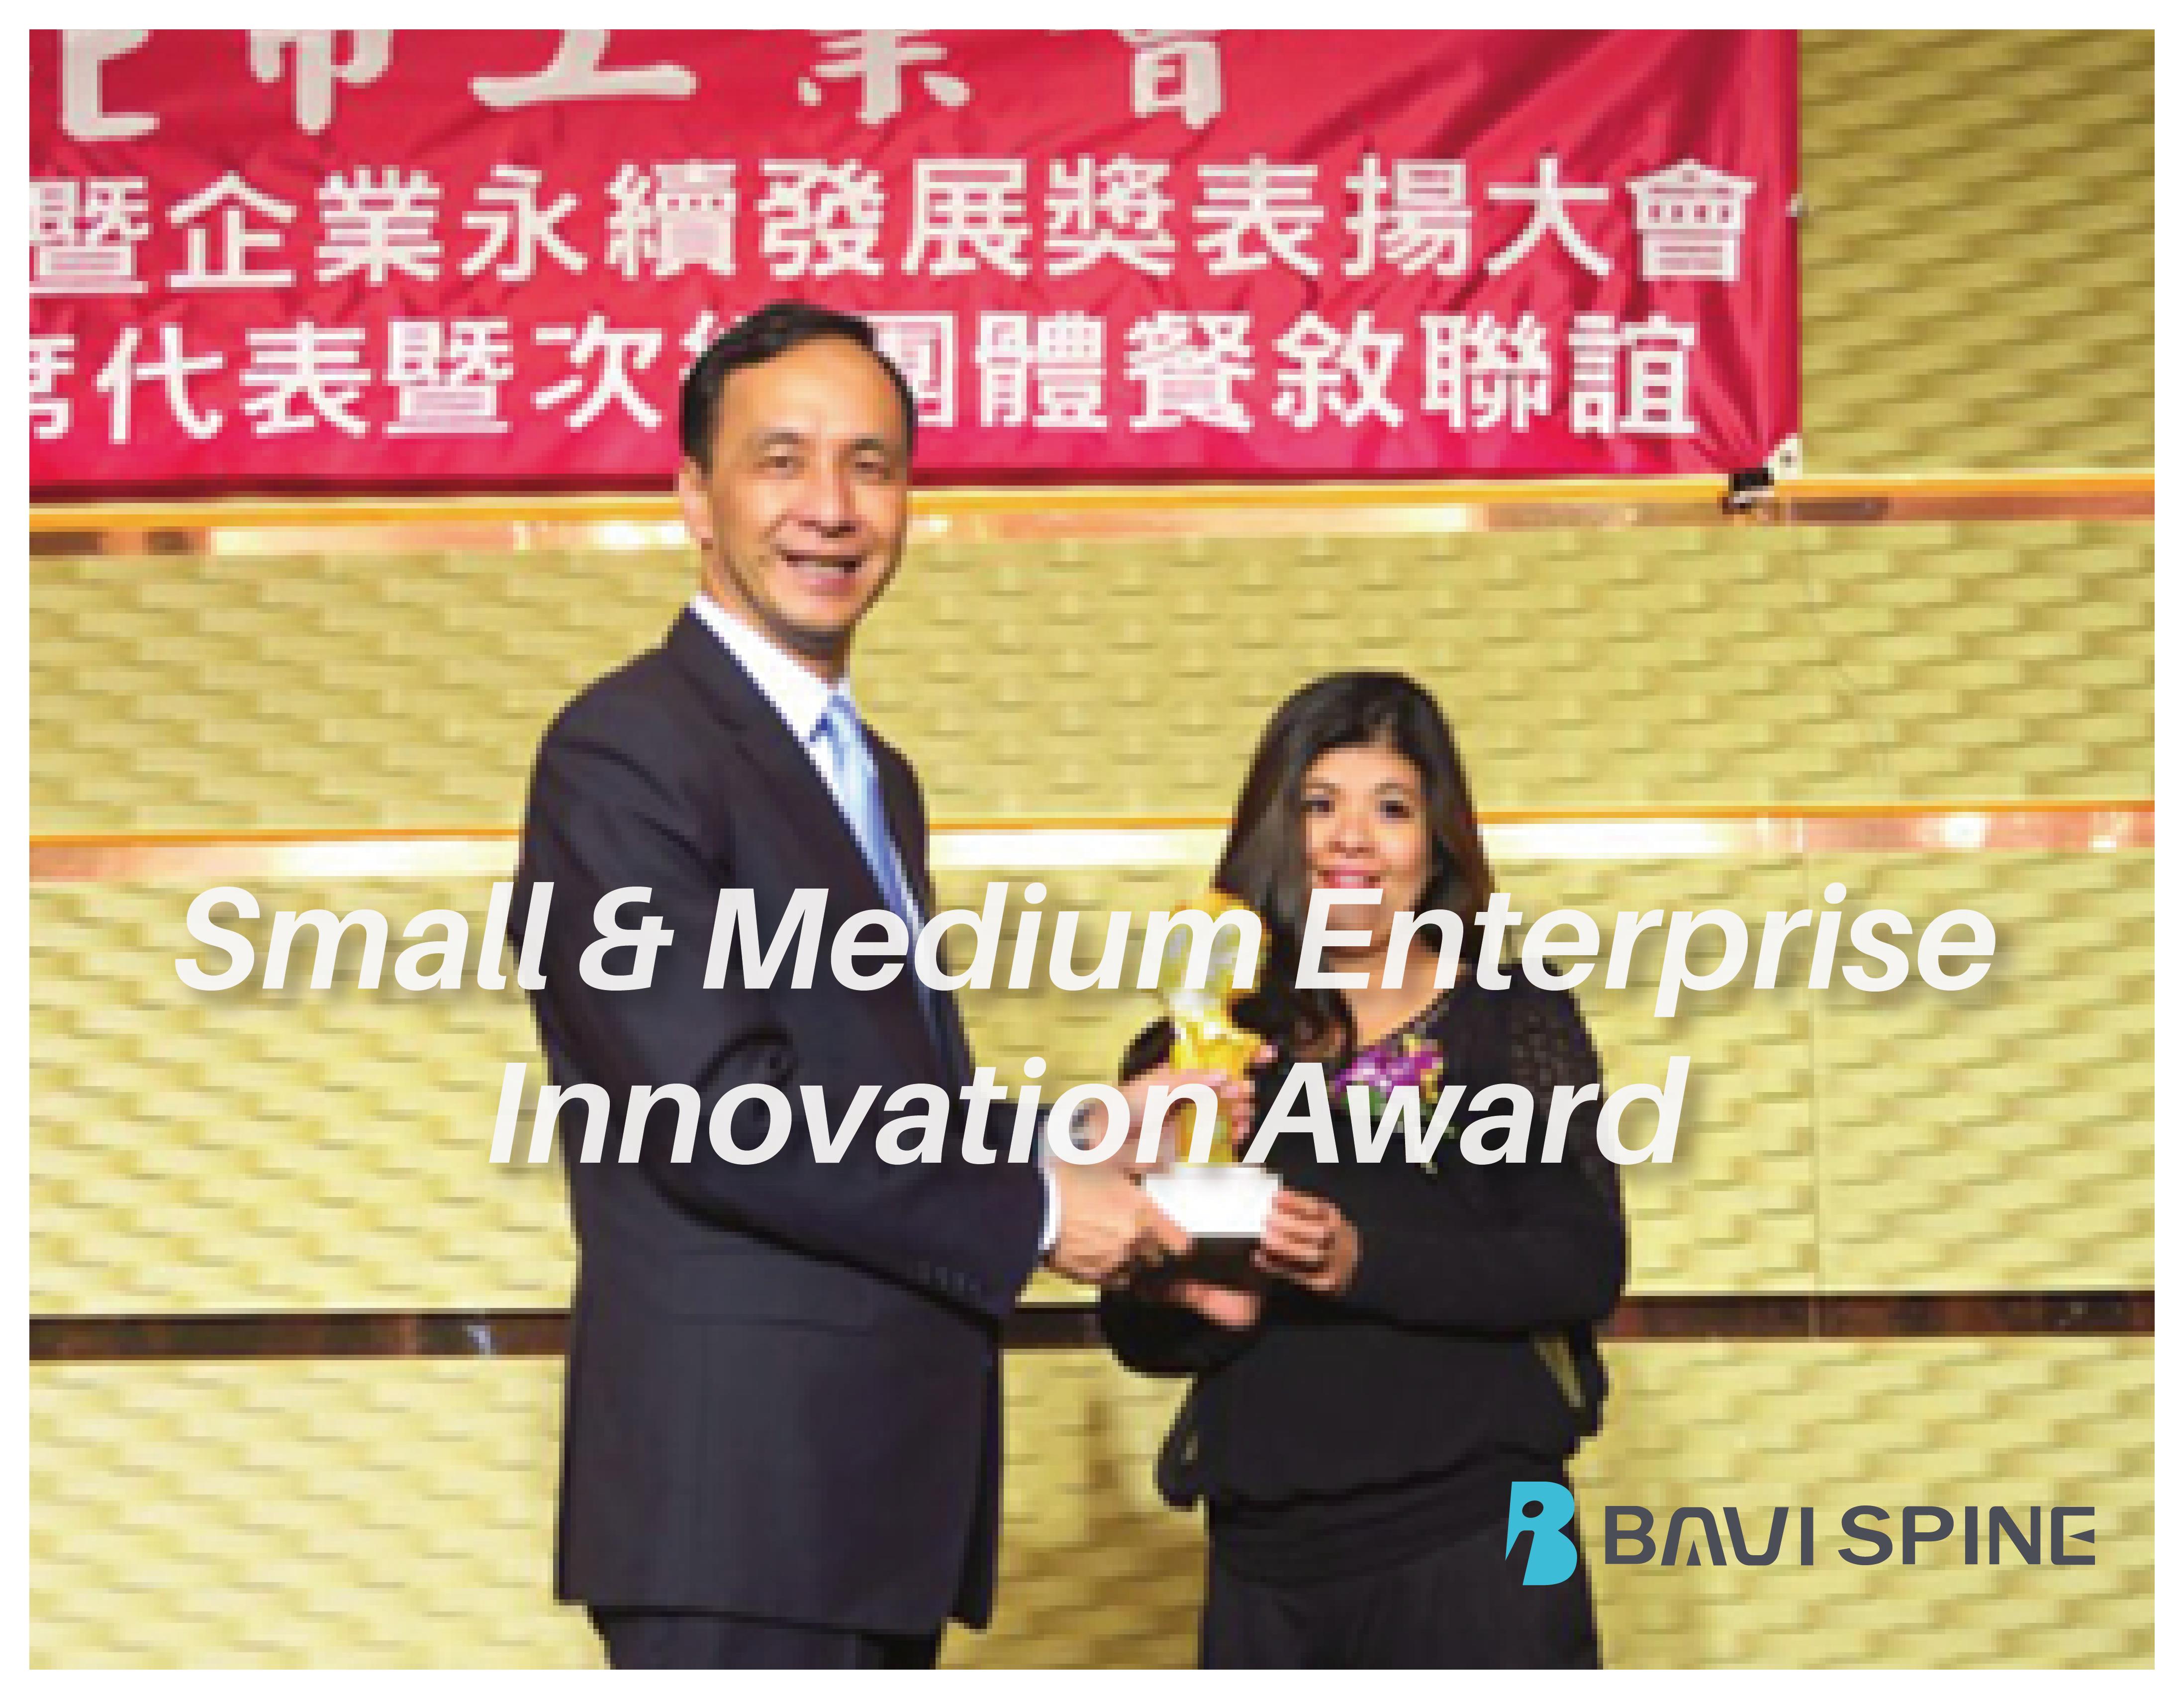 Enterprises Innovation Award